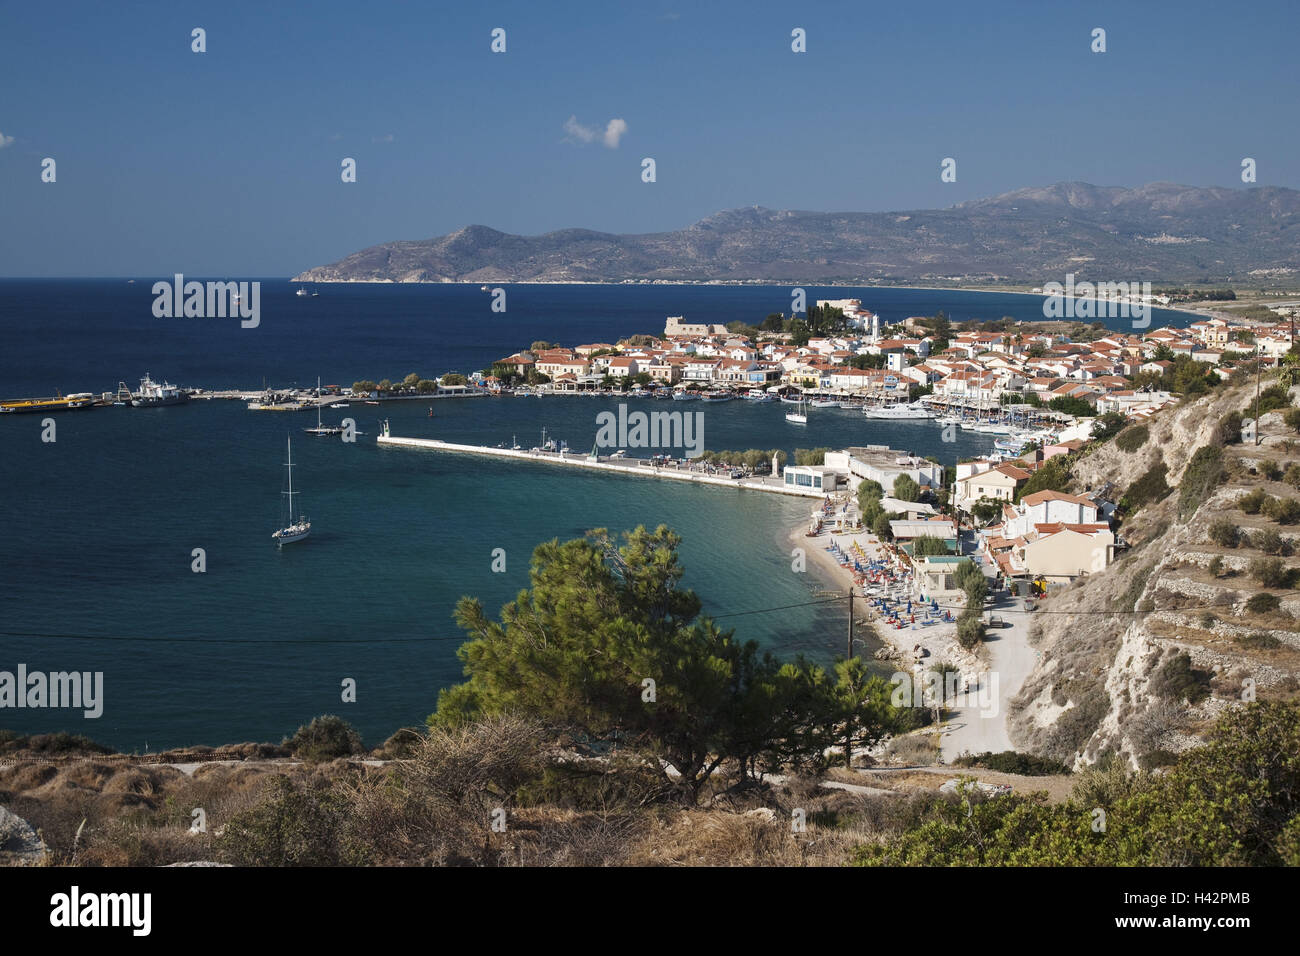 Remetaki Beach, Pythagorion, island Samos, Mediterranean island, Greece, Europe, Stock Photo